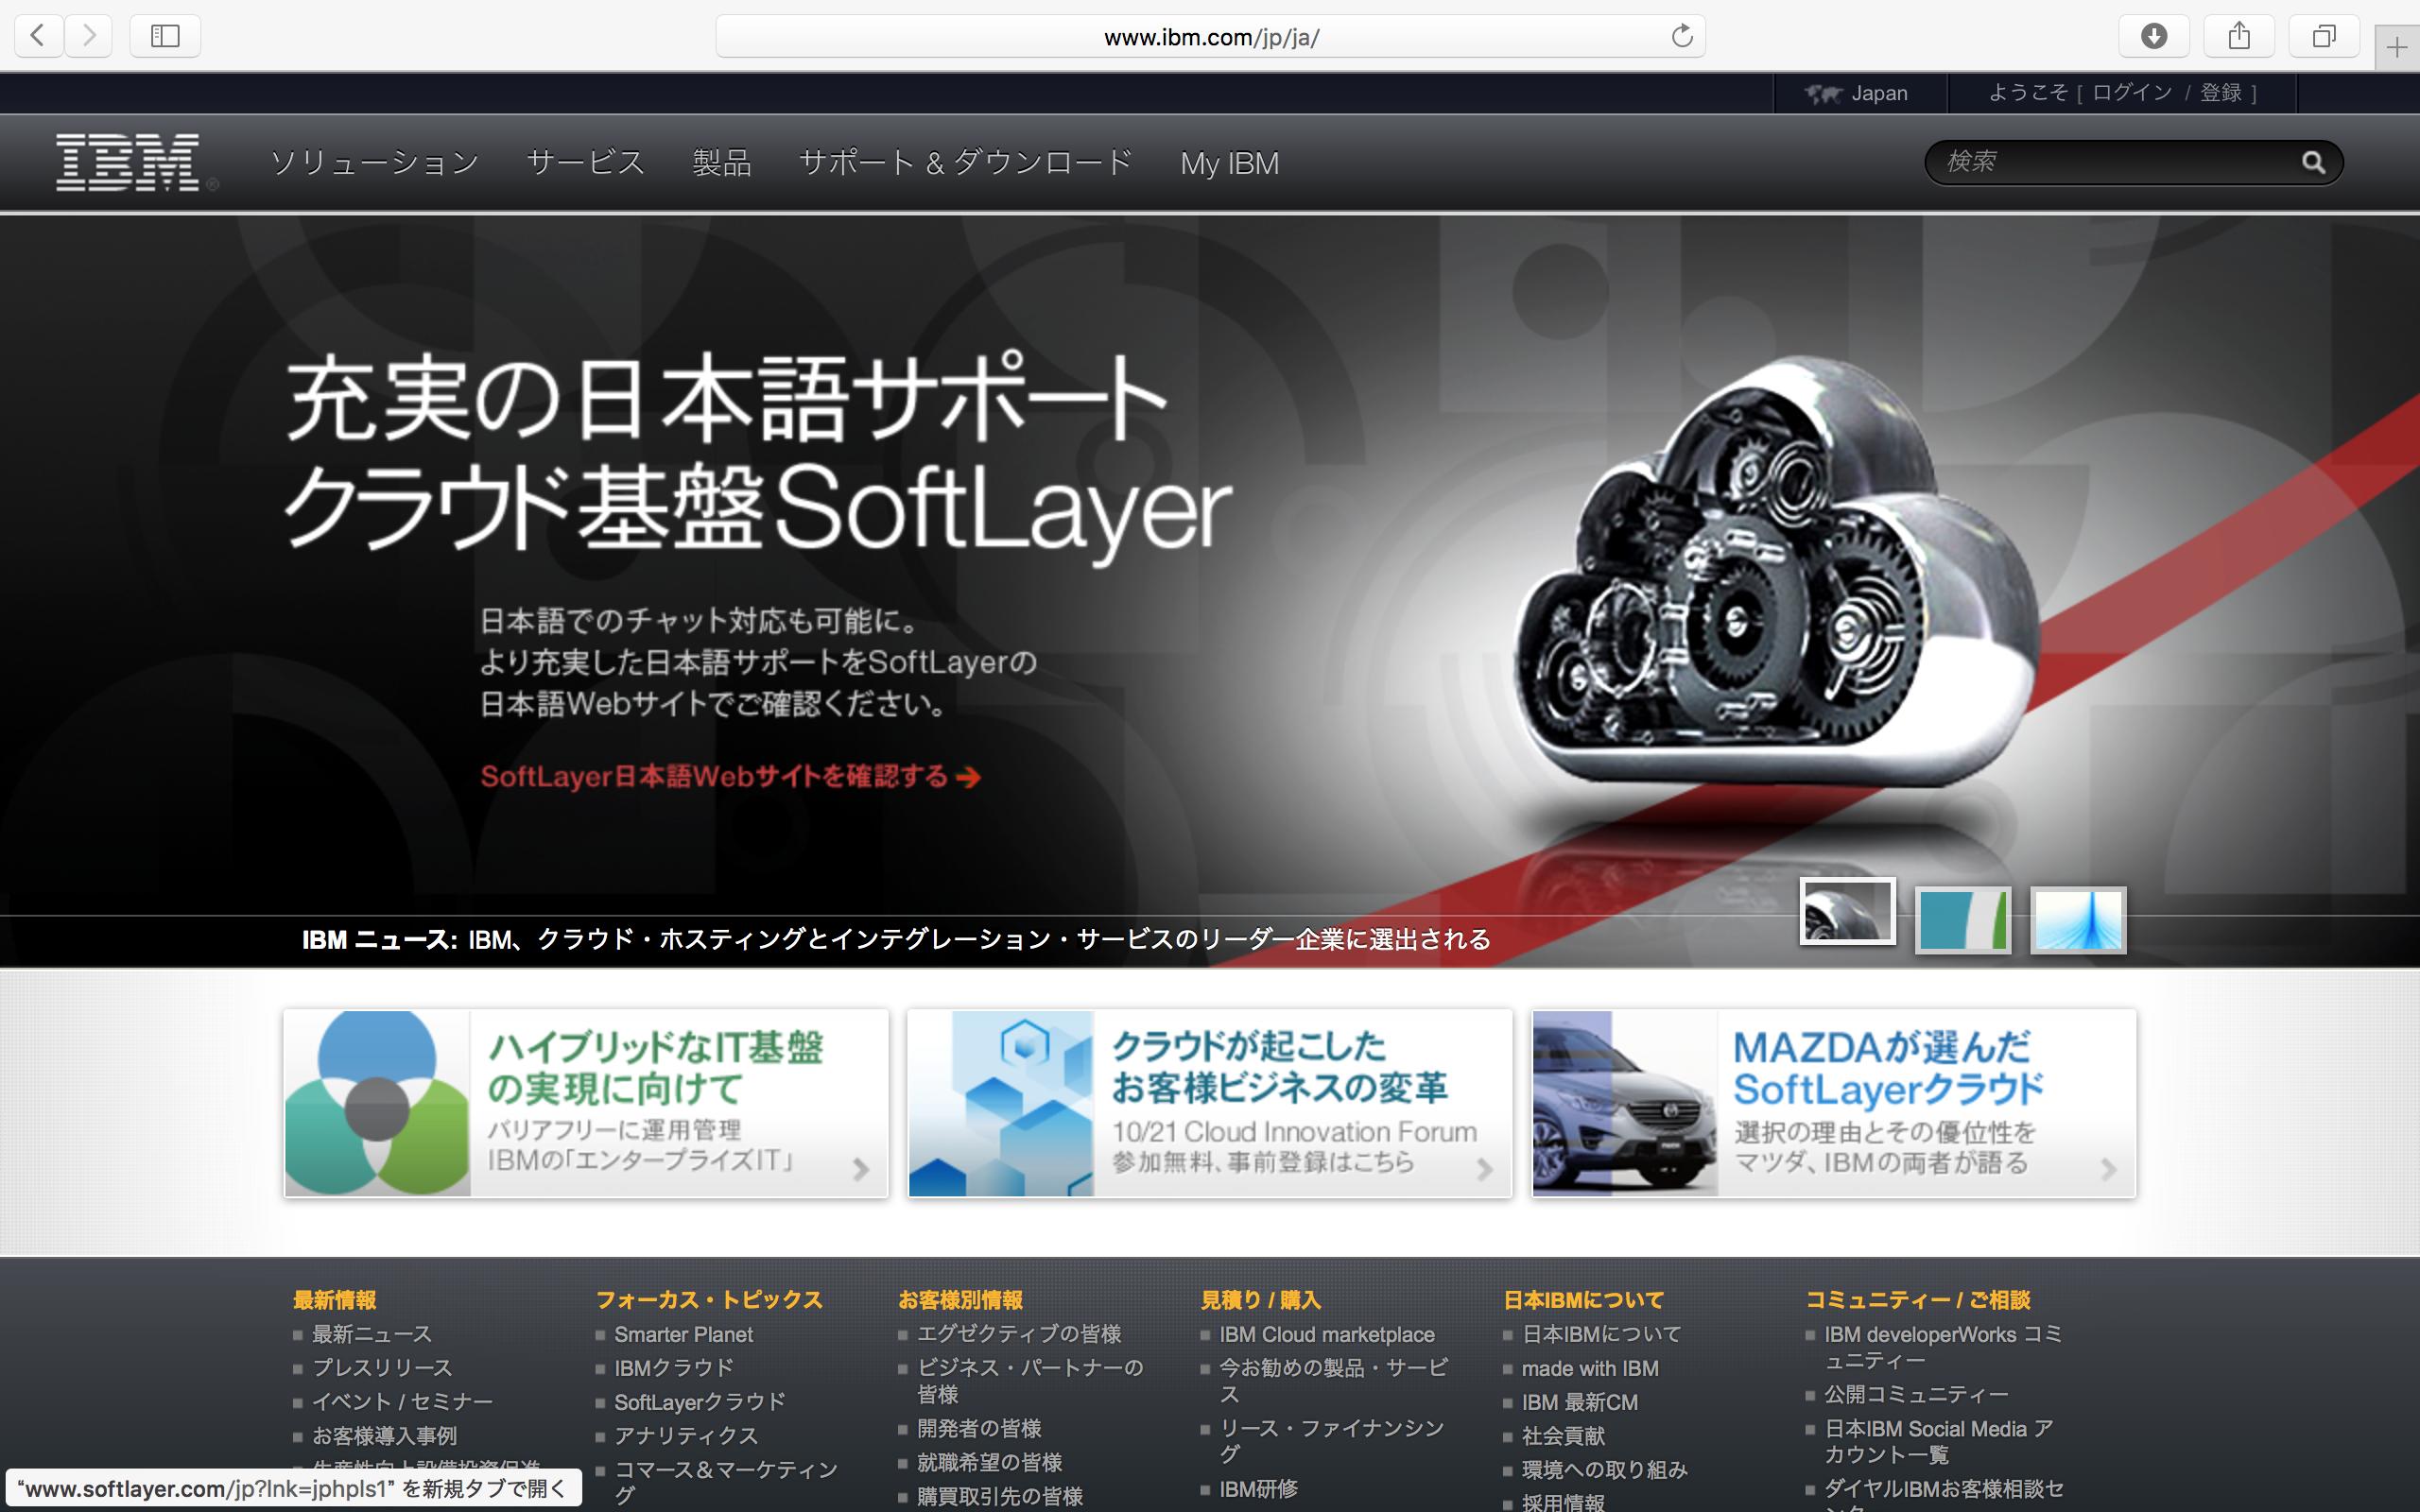 2015 Interbrand - IBM